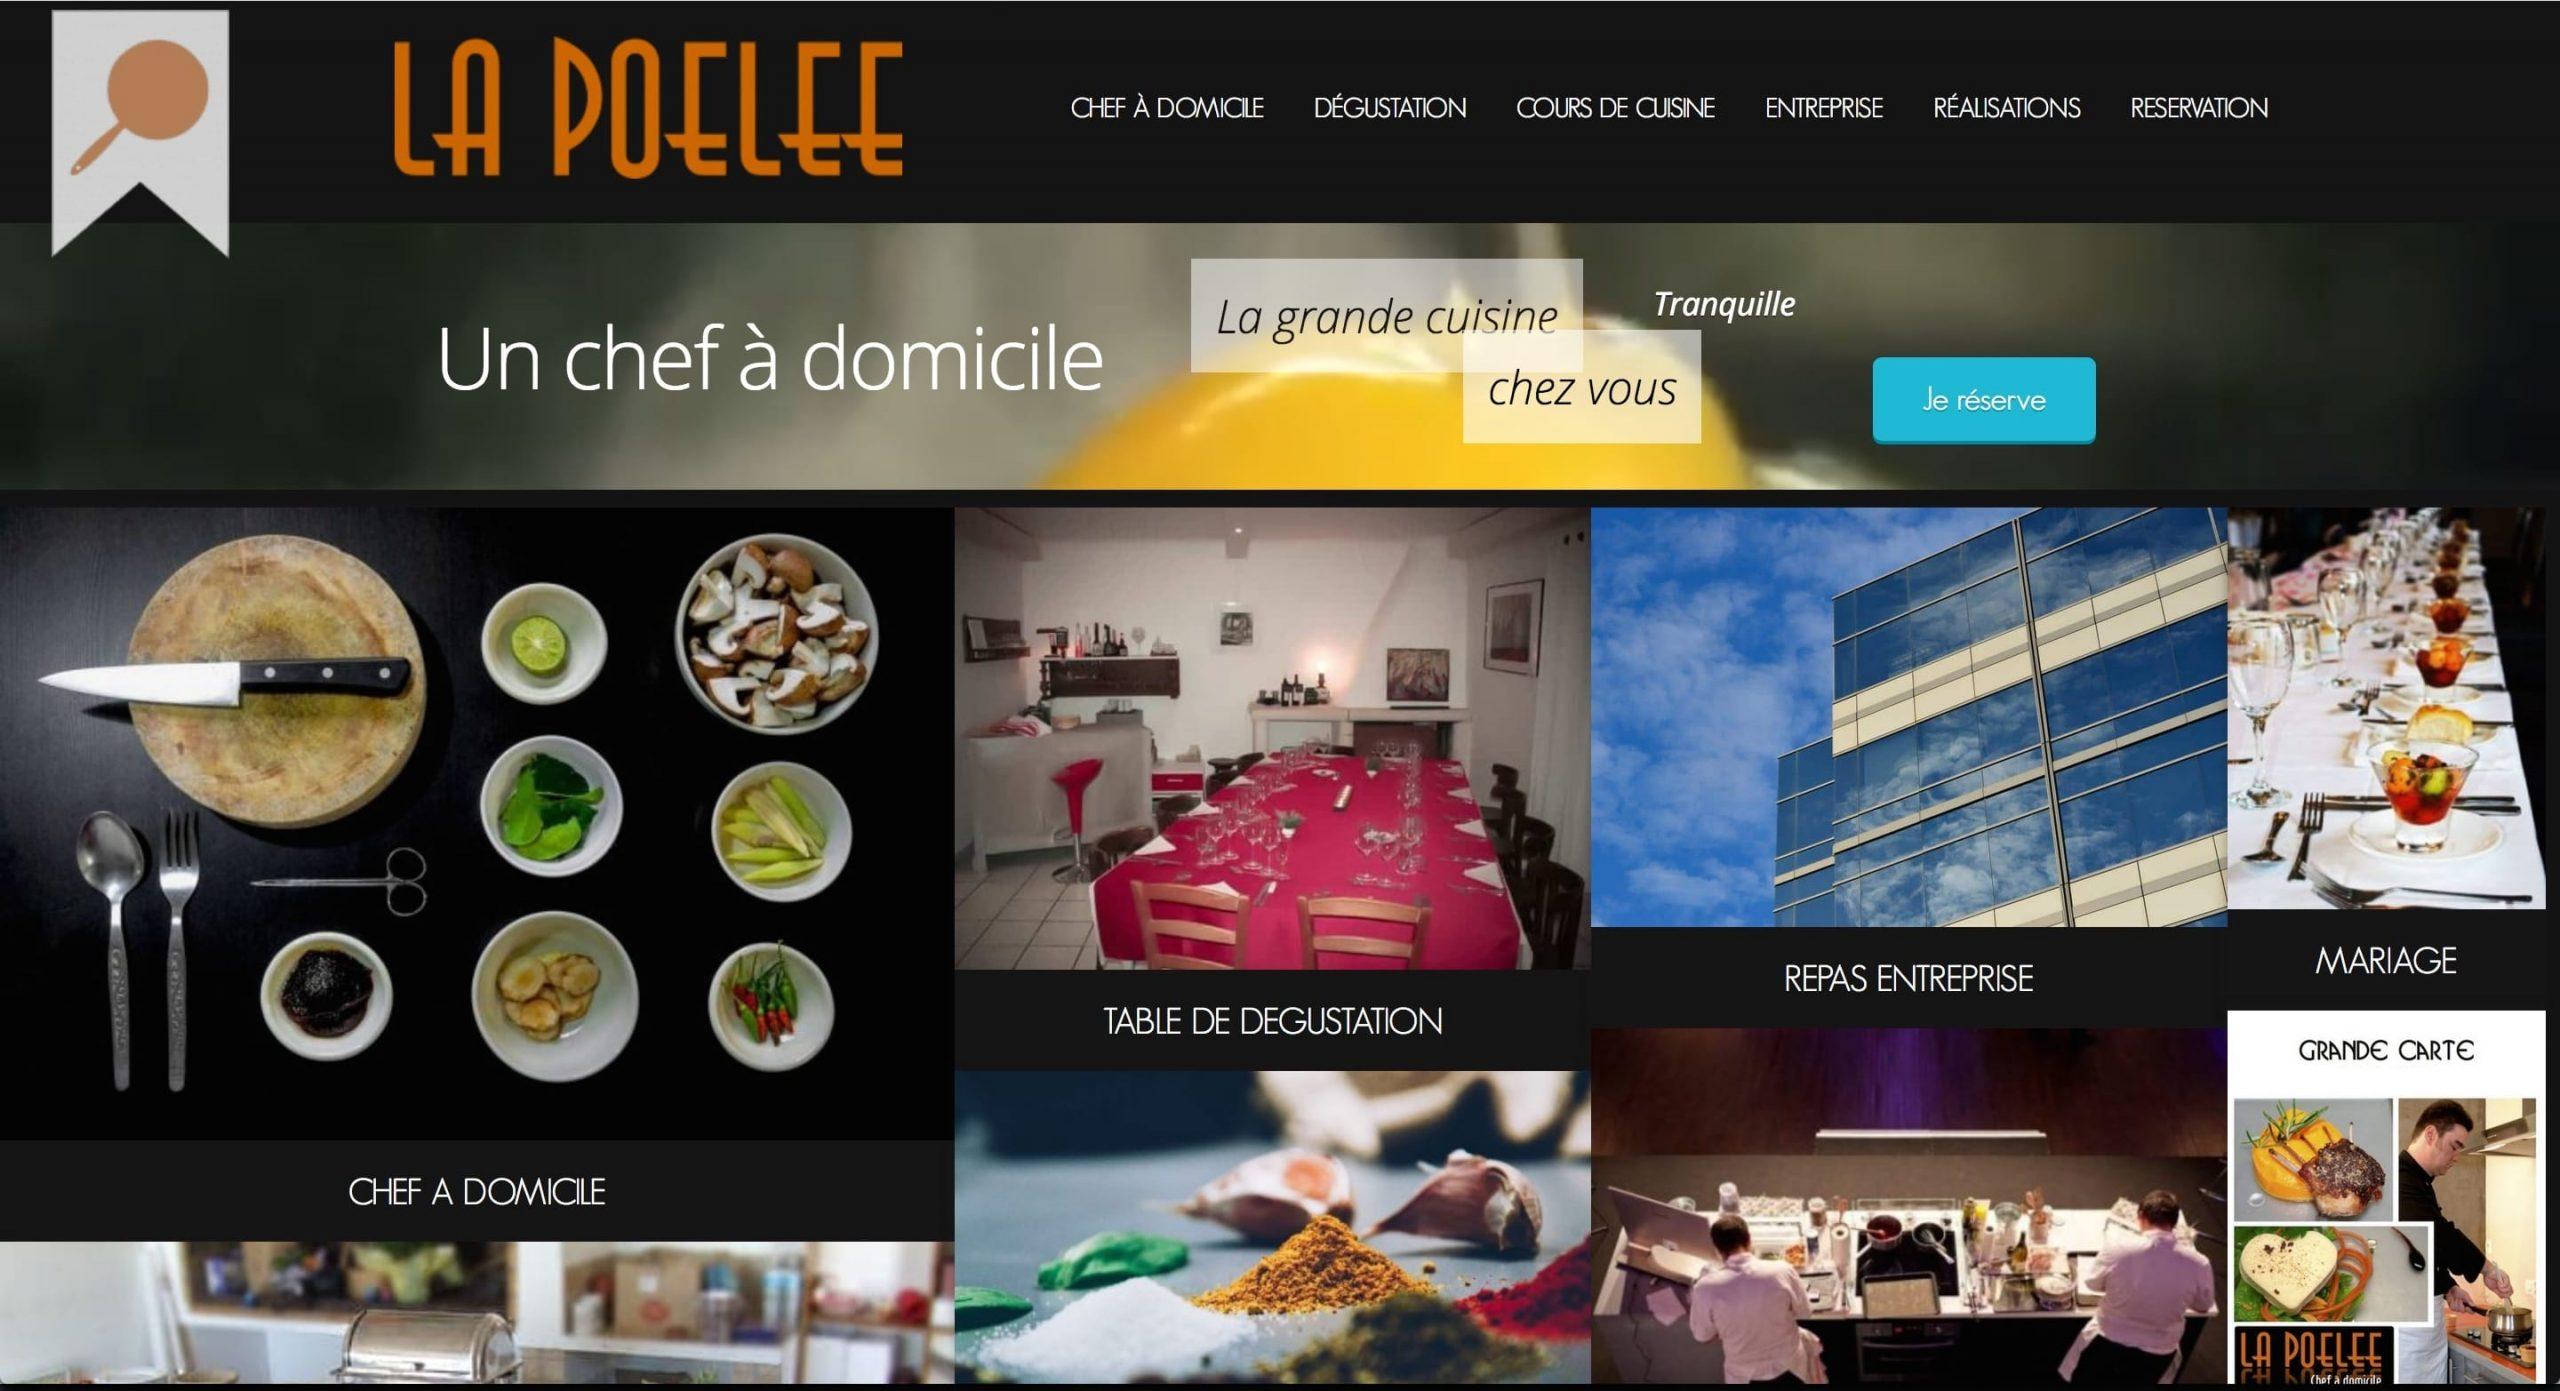 La Poelee - Julien Webotop